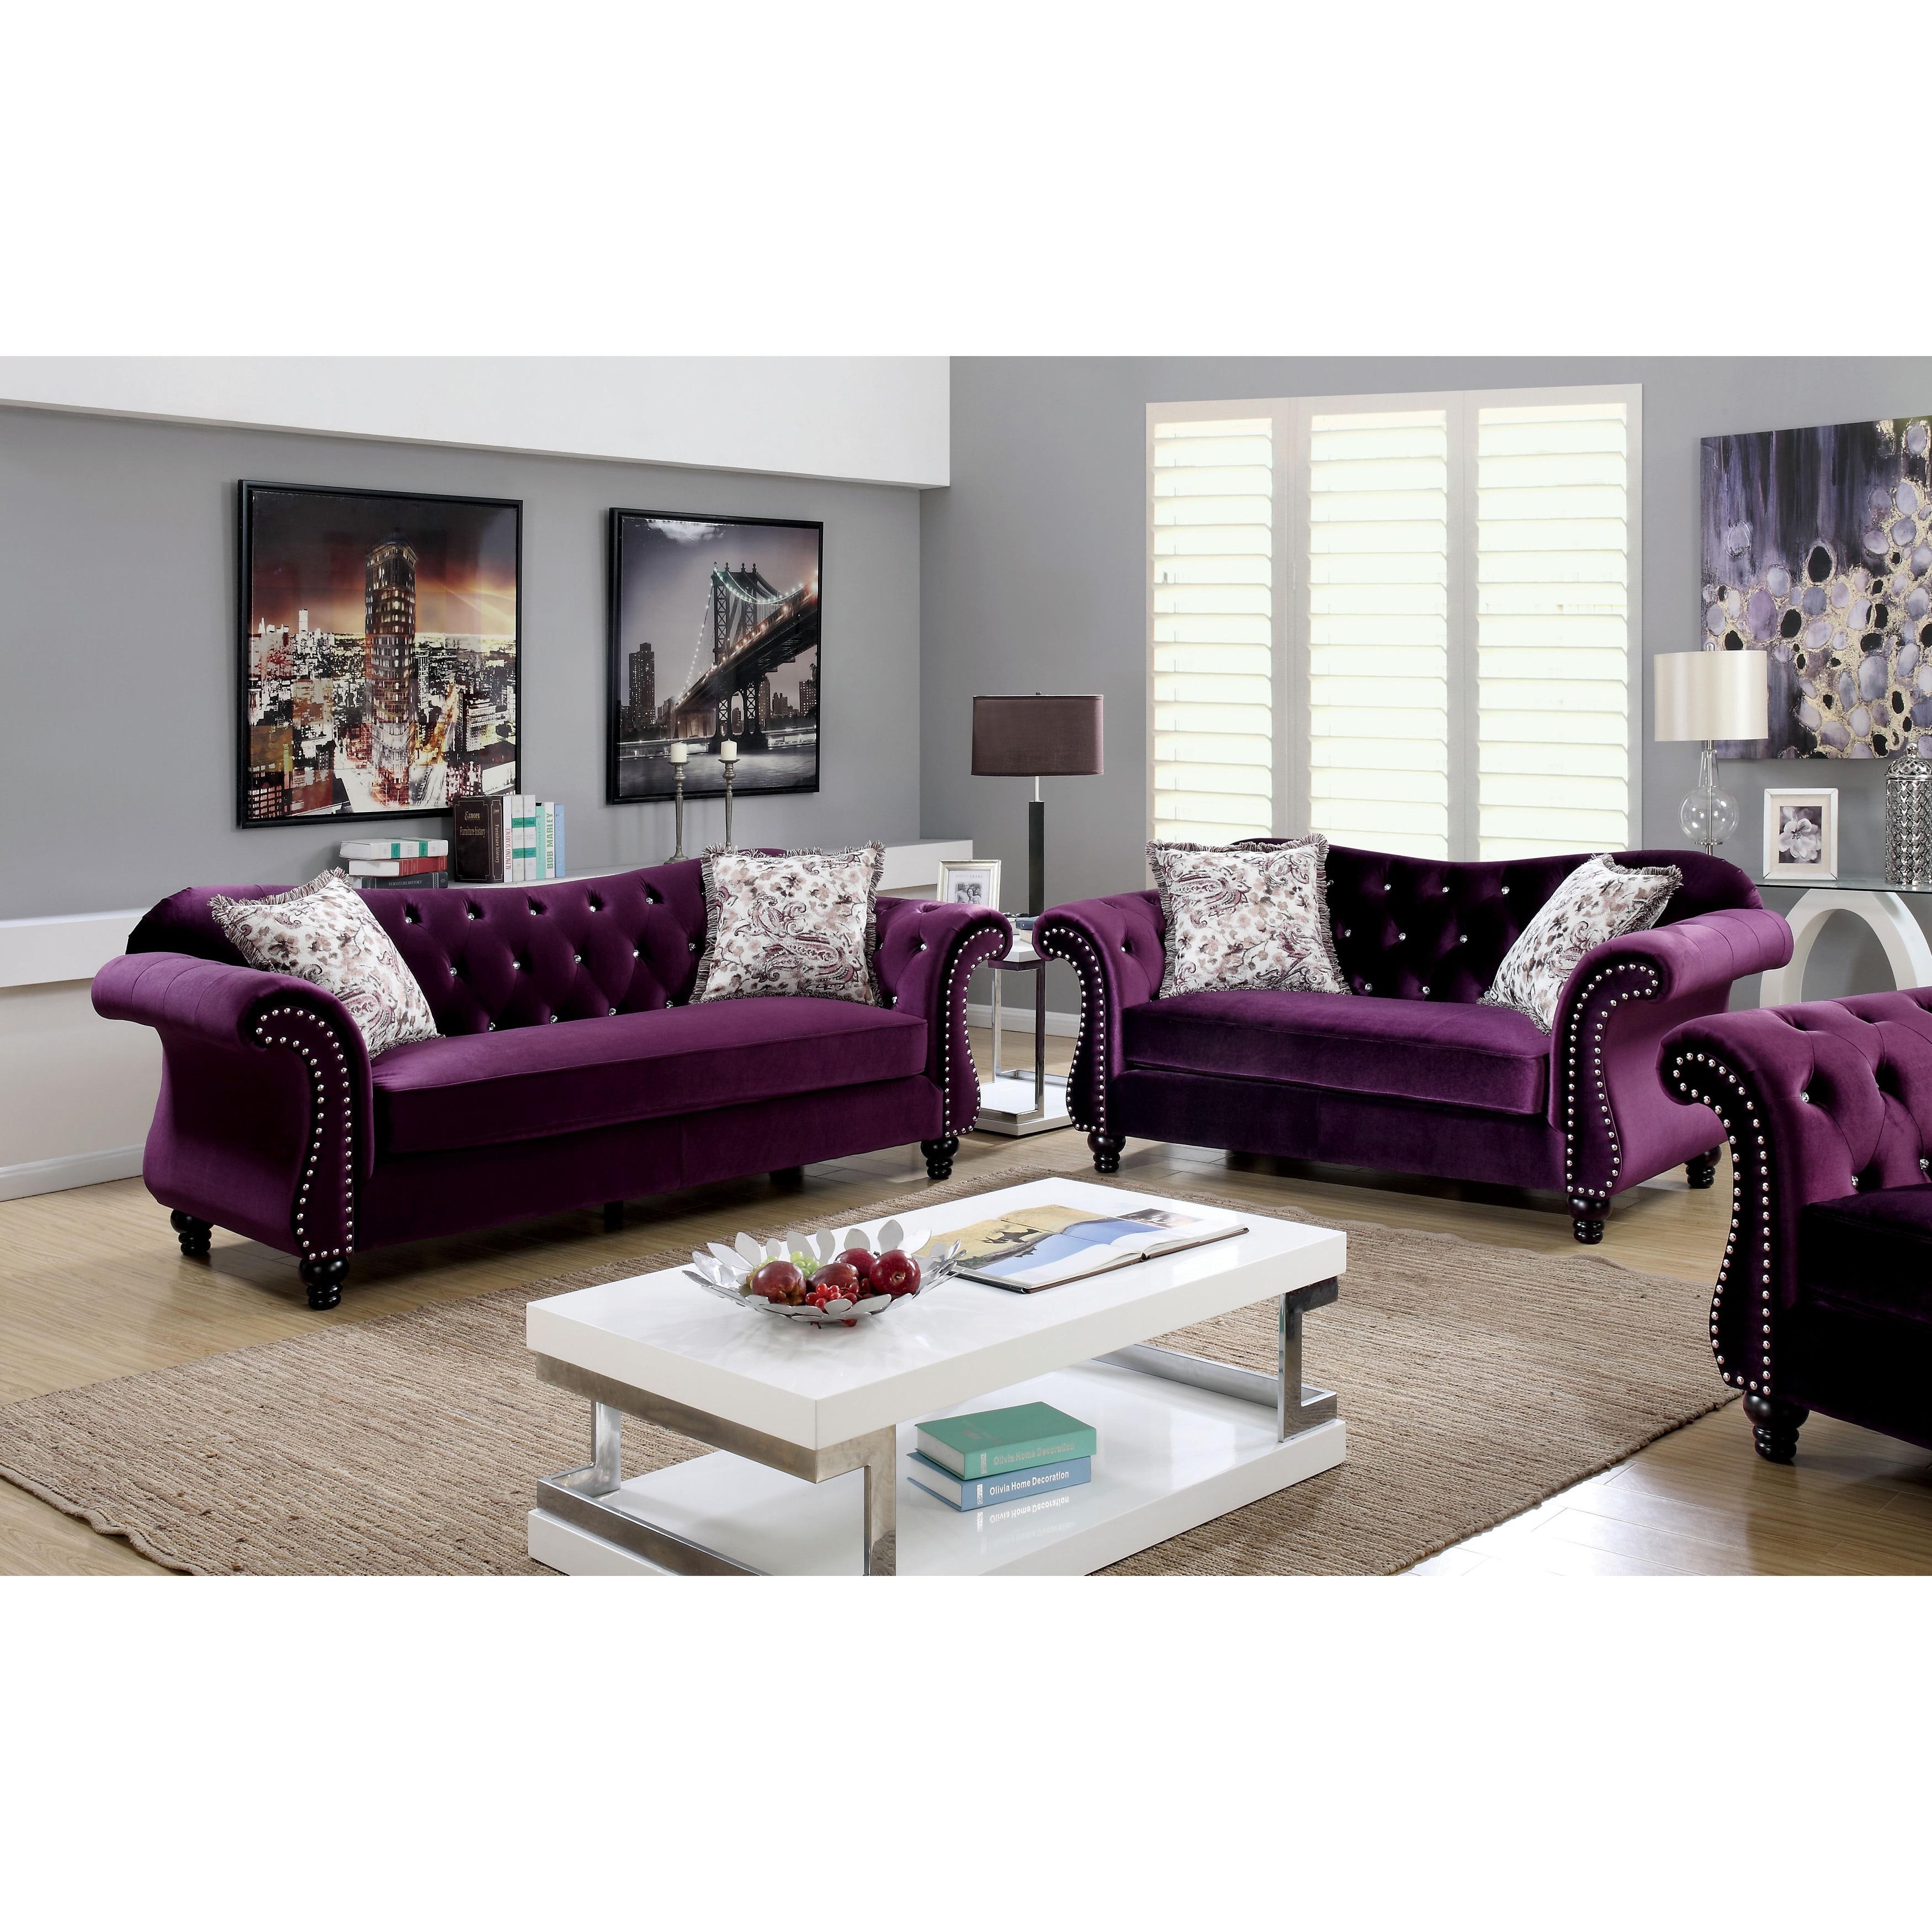 Awe Inspiring Dessie Traditional 3 Piece Tufted Sofa Set By Foa Creativecarmelina Interior Chair Design Creativecarmelinacom